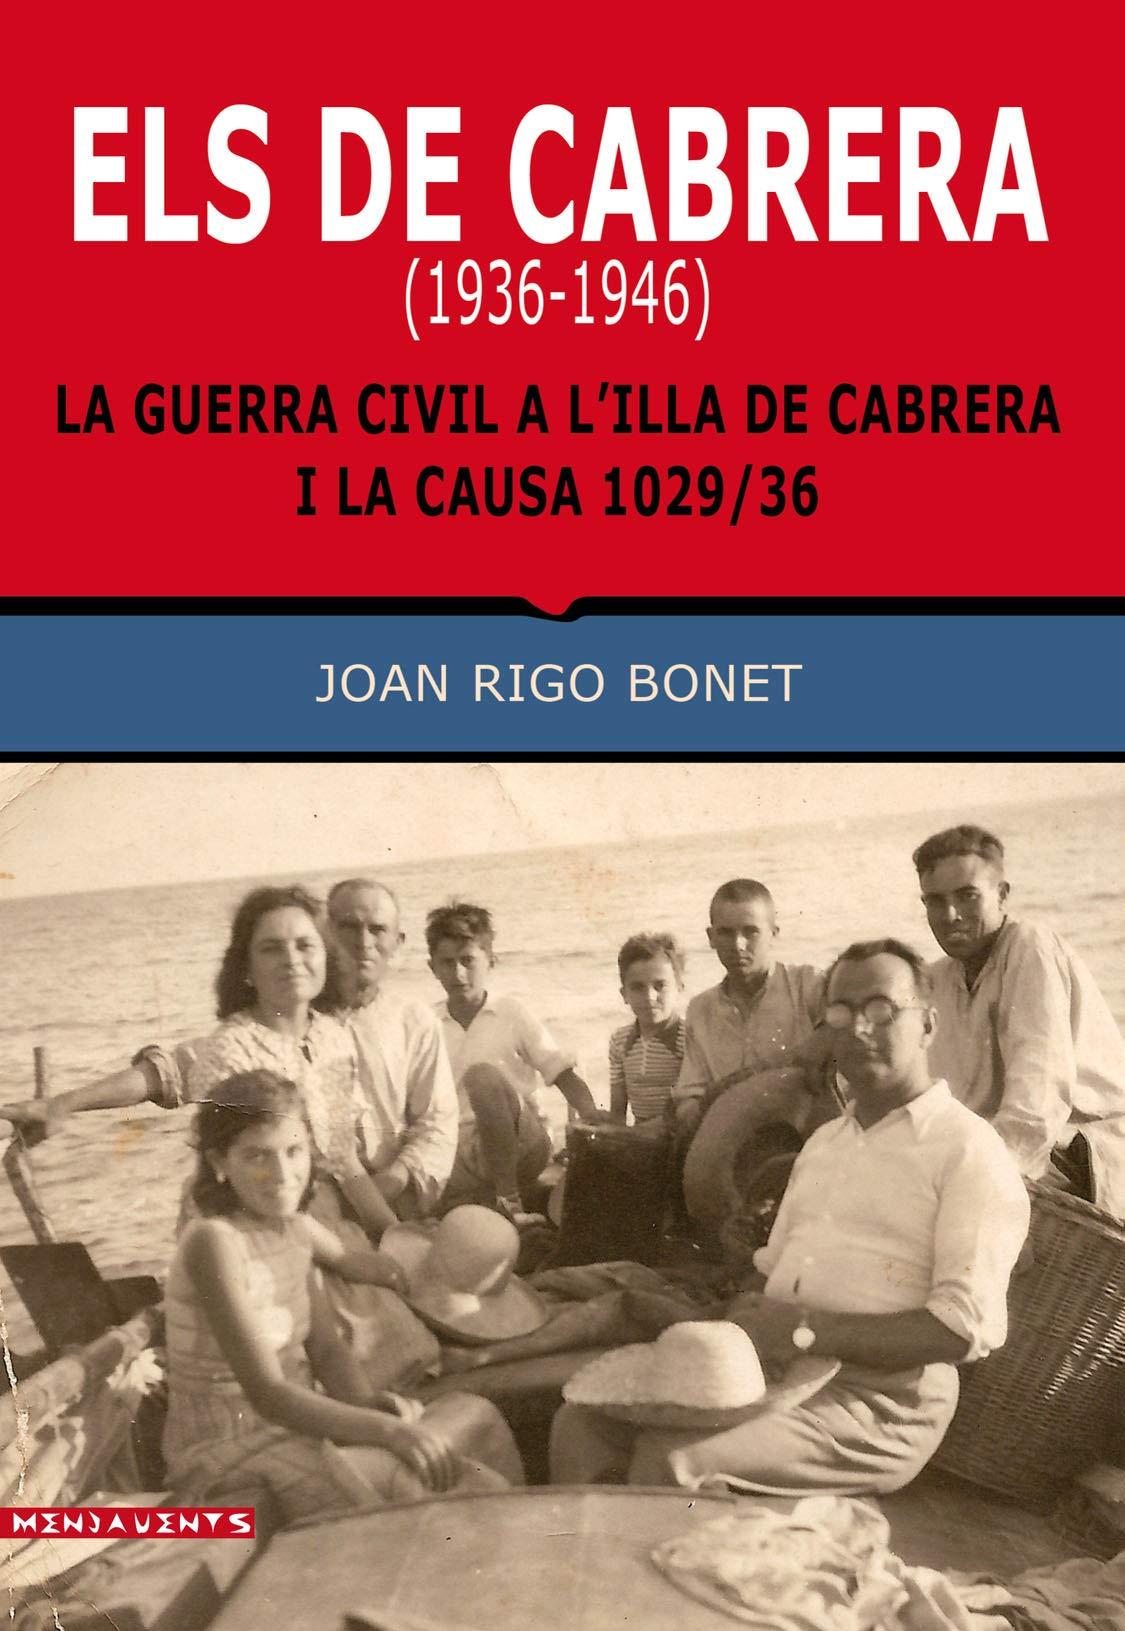 Els de cabrera (1936-1946)